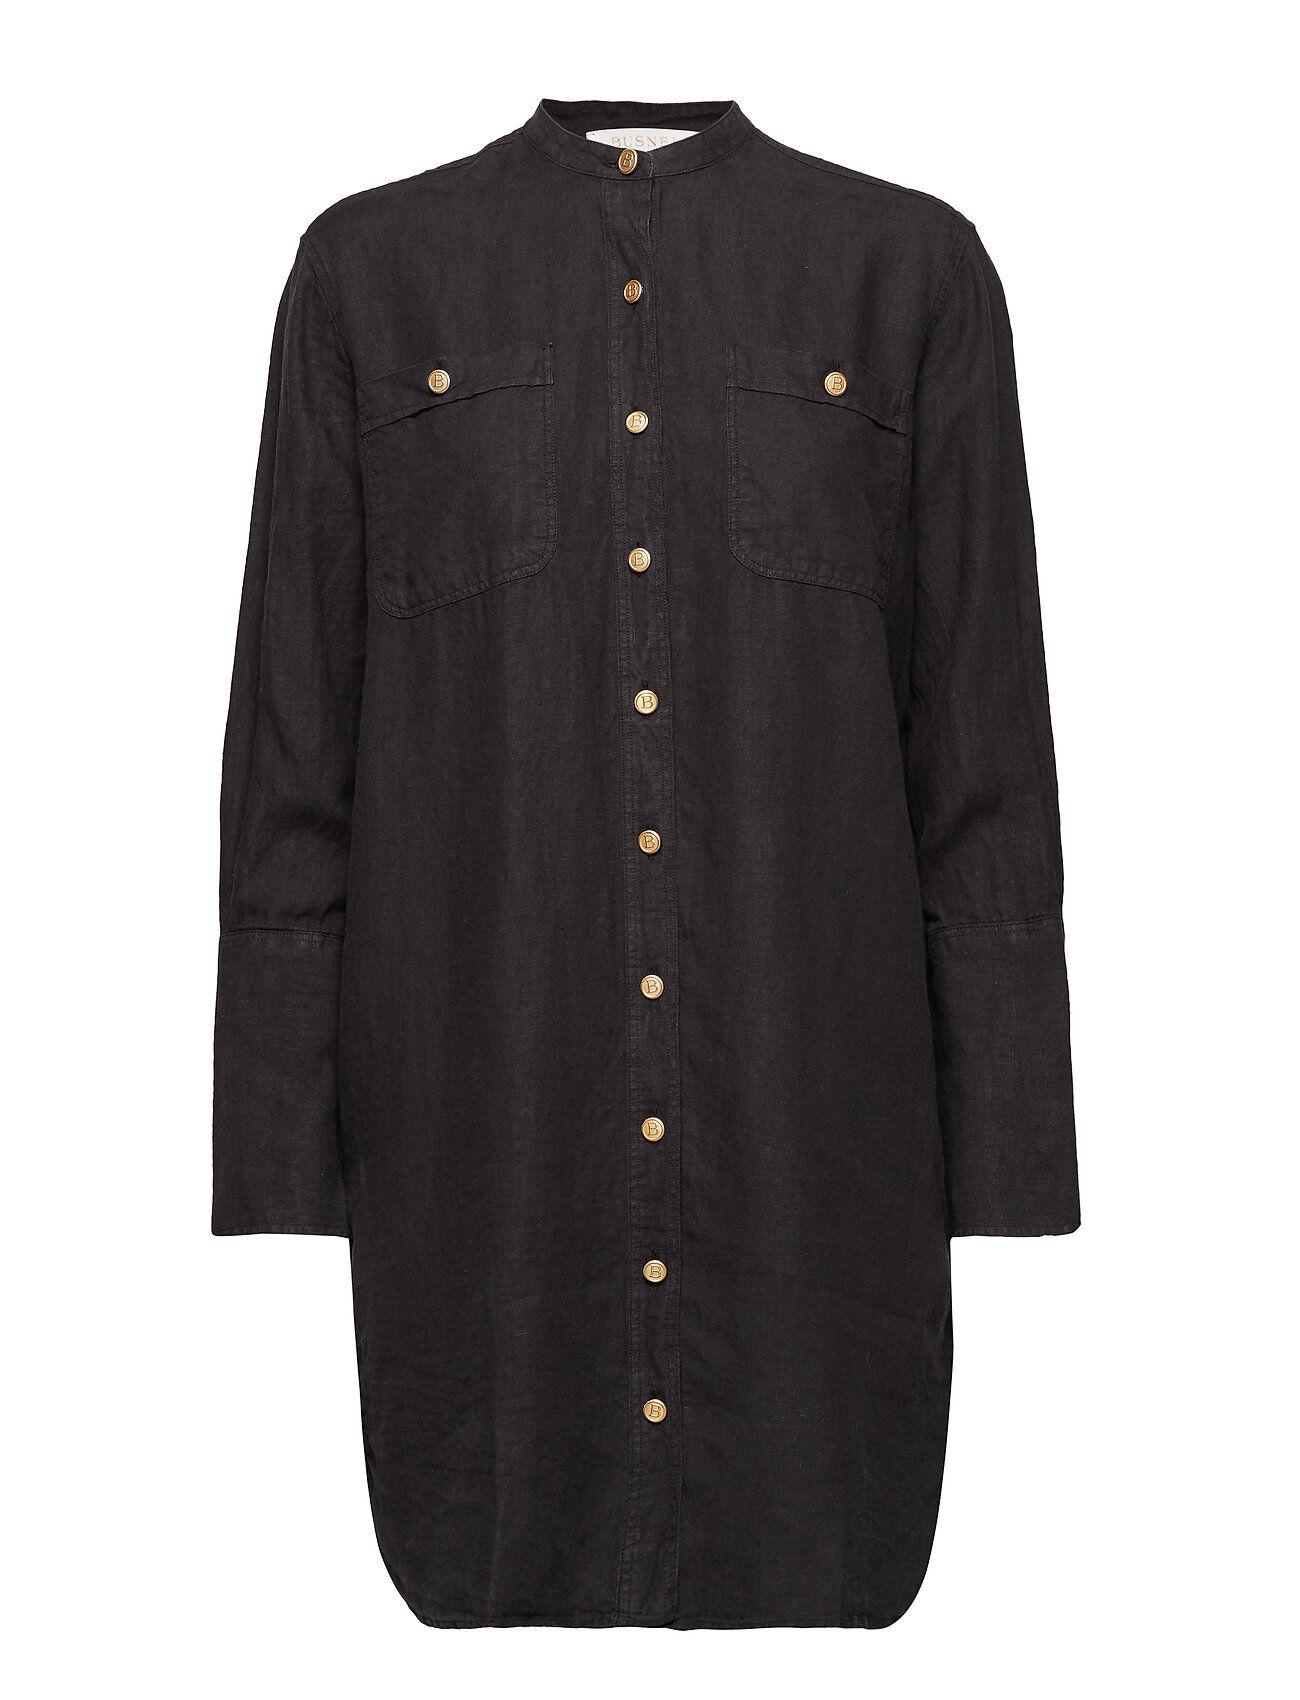 BUSNEL Treverec Shirt